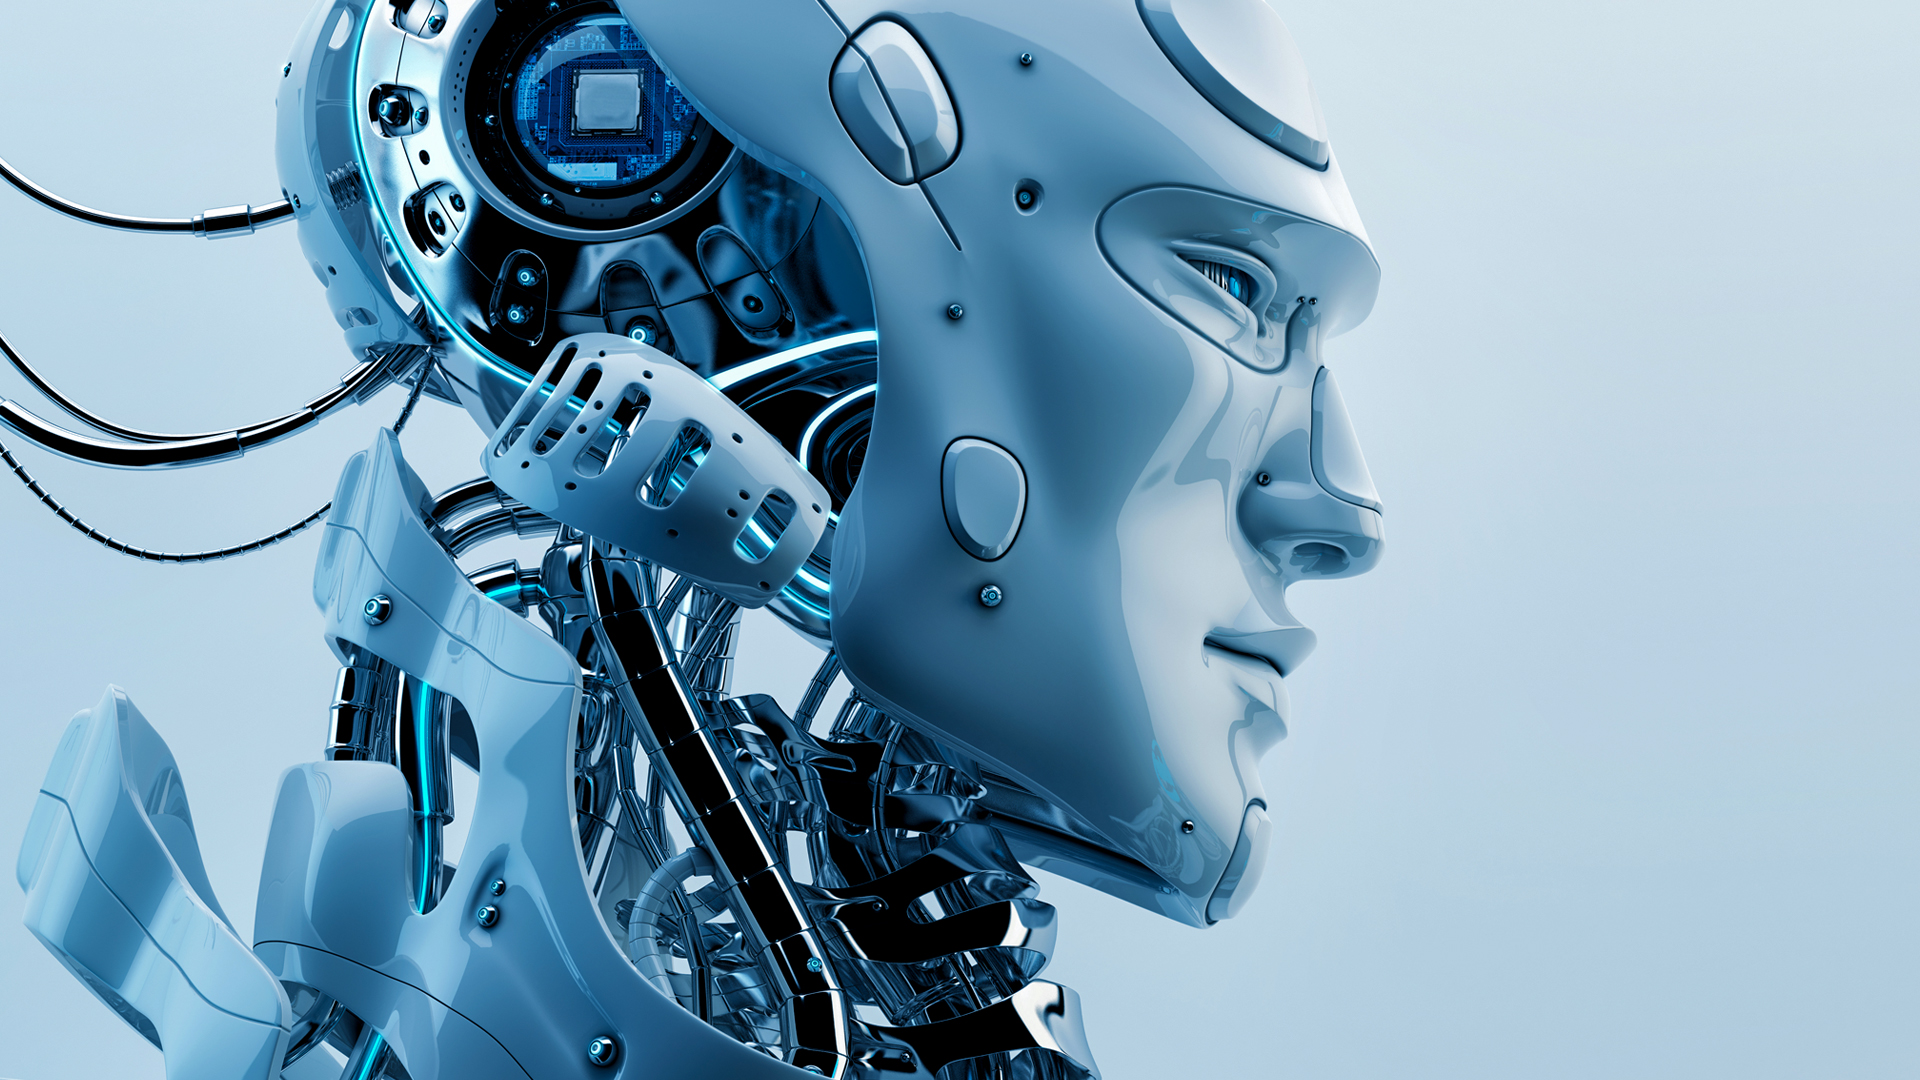 European Business Ai And Robotics 2019 The Netherlands